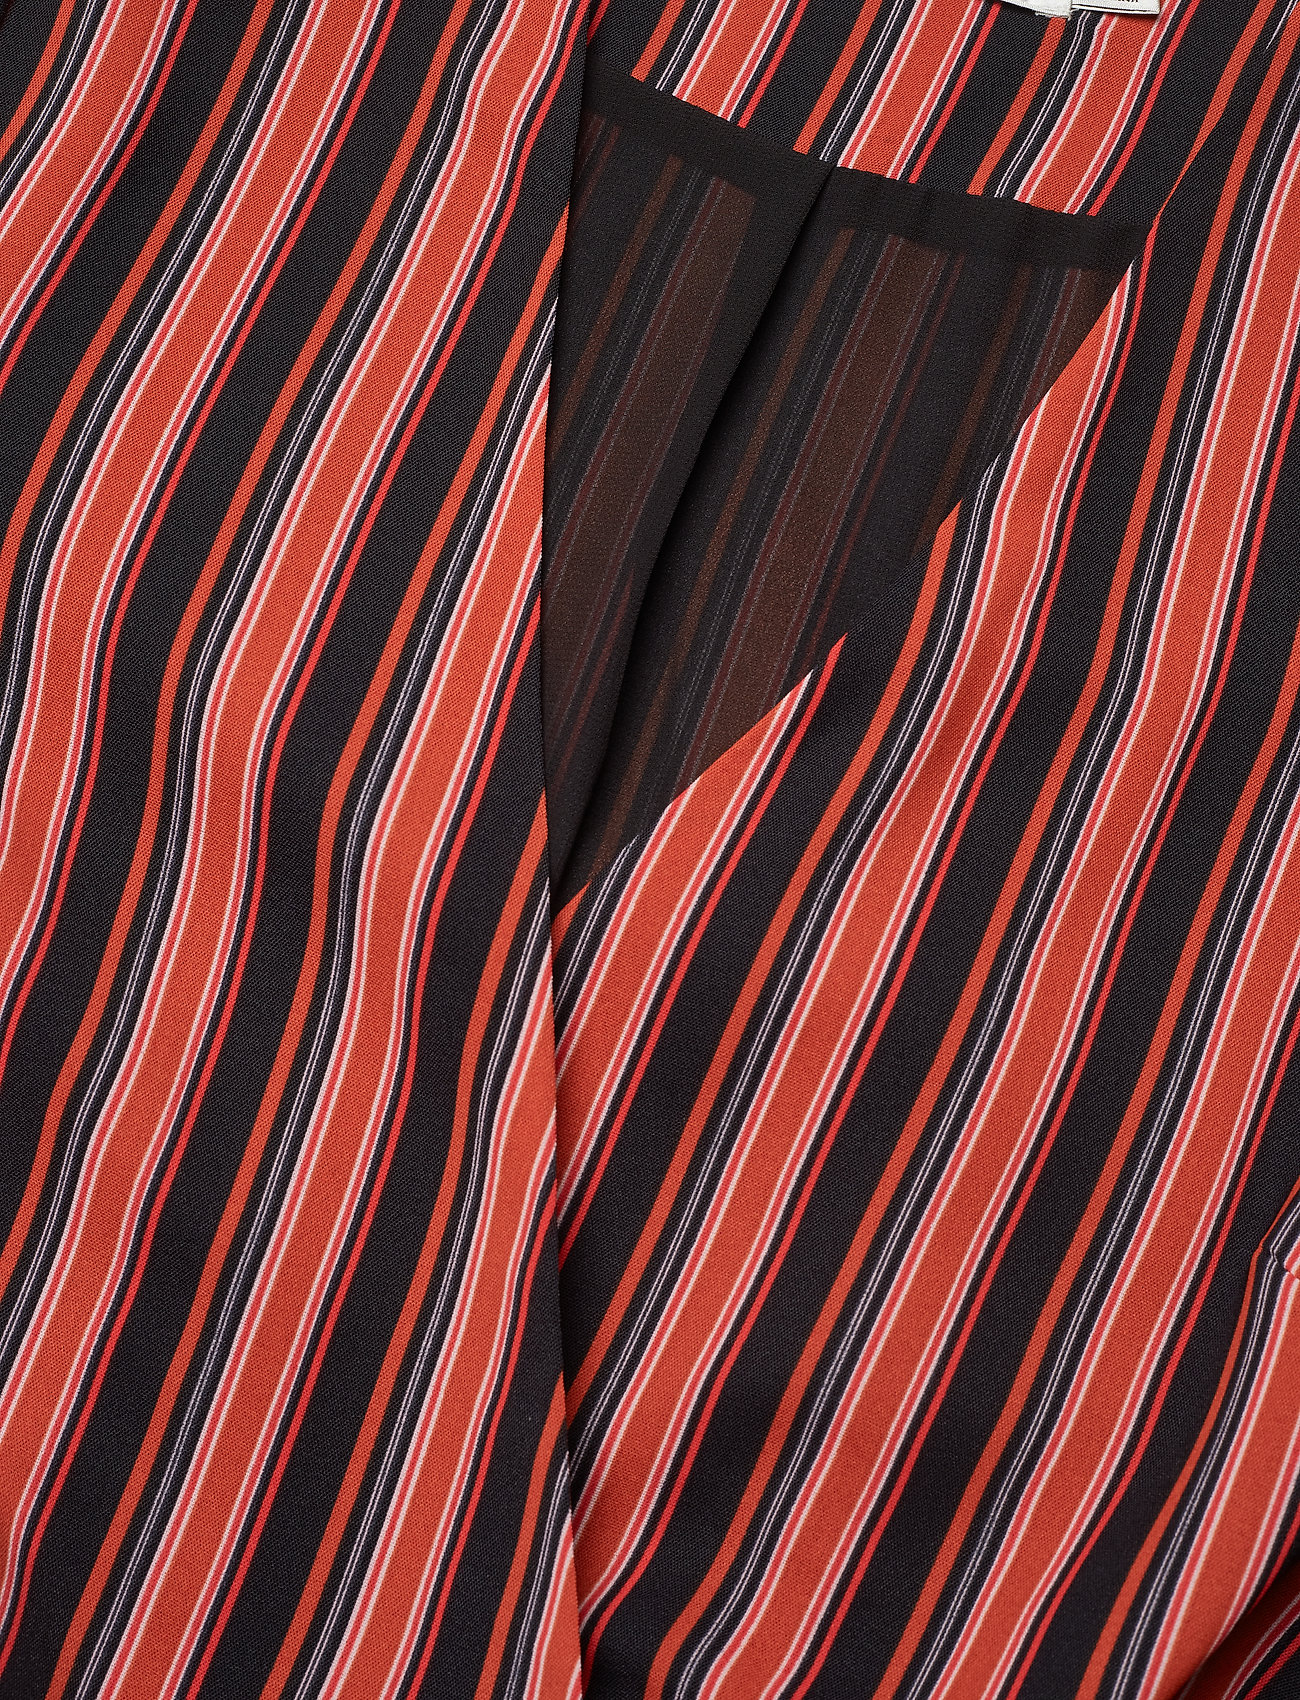 Tillygz Multi Tillygz StripeGestuz Ao19black Dress dtrBsxhQC